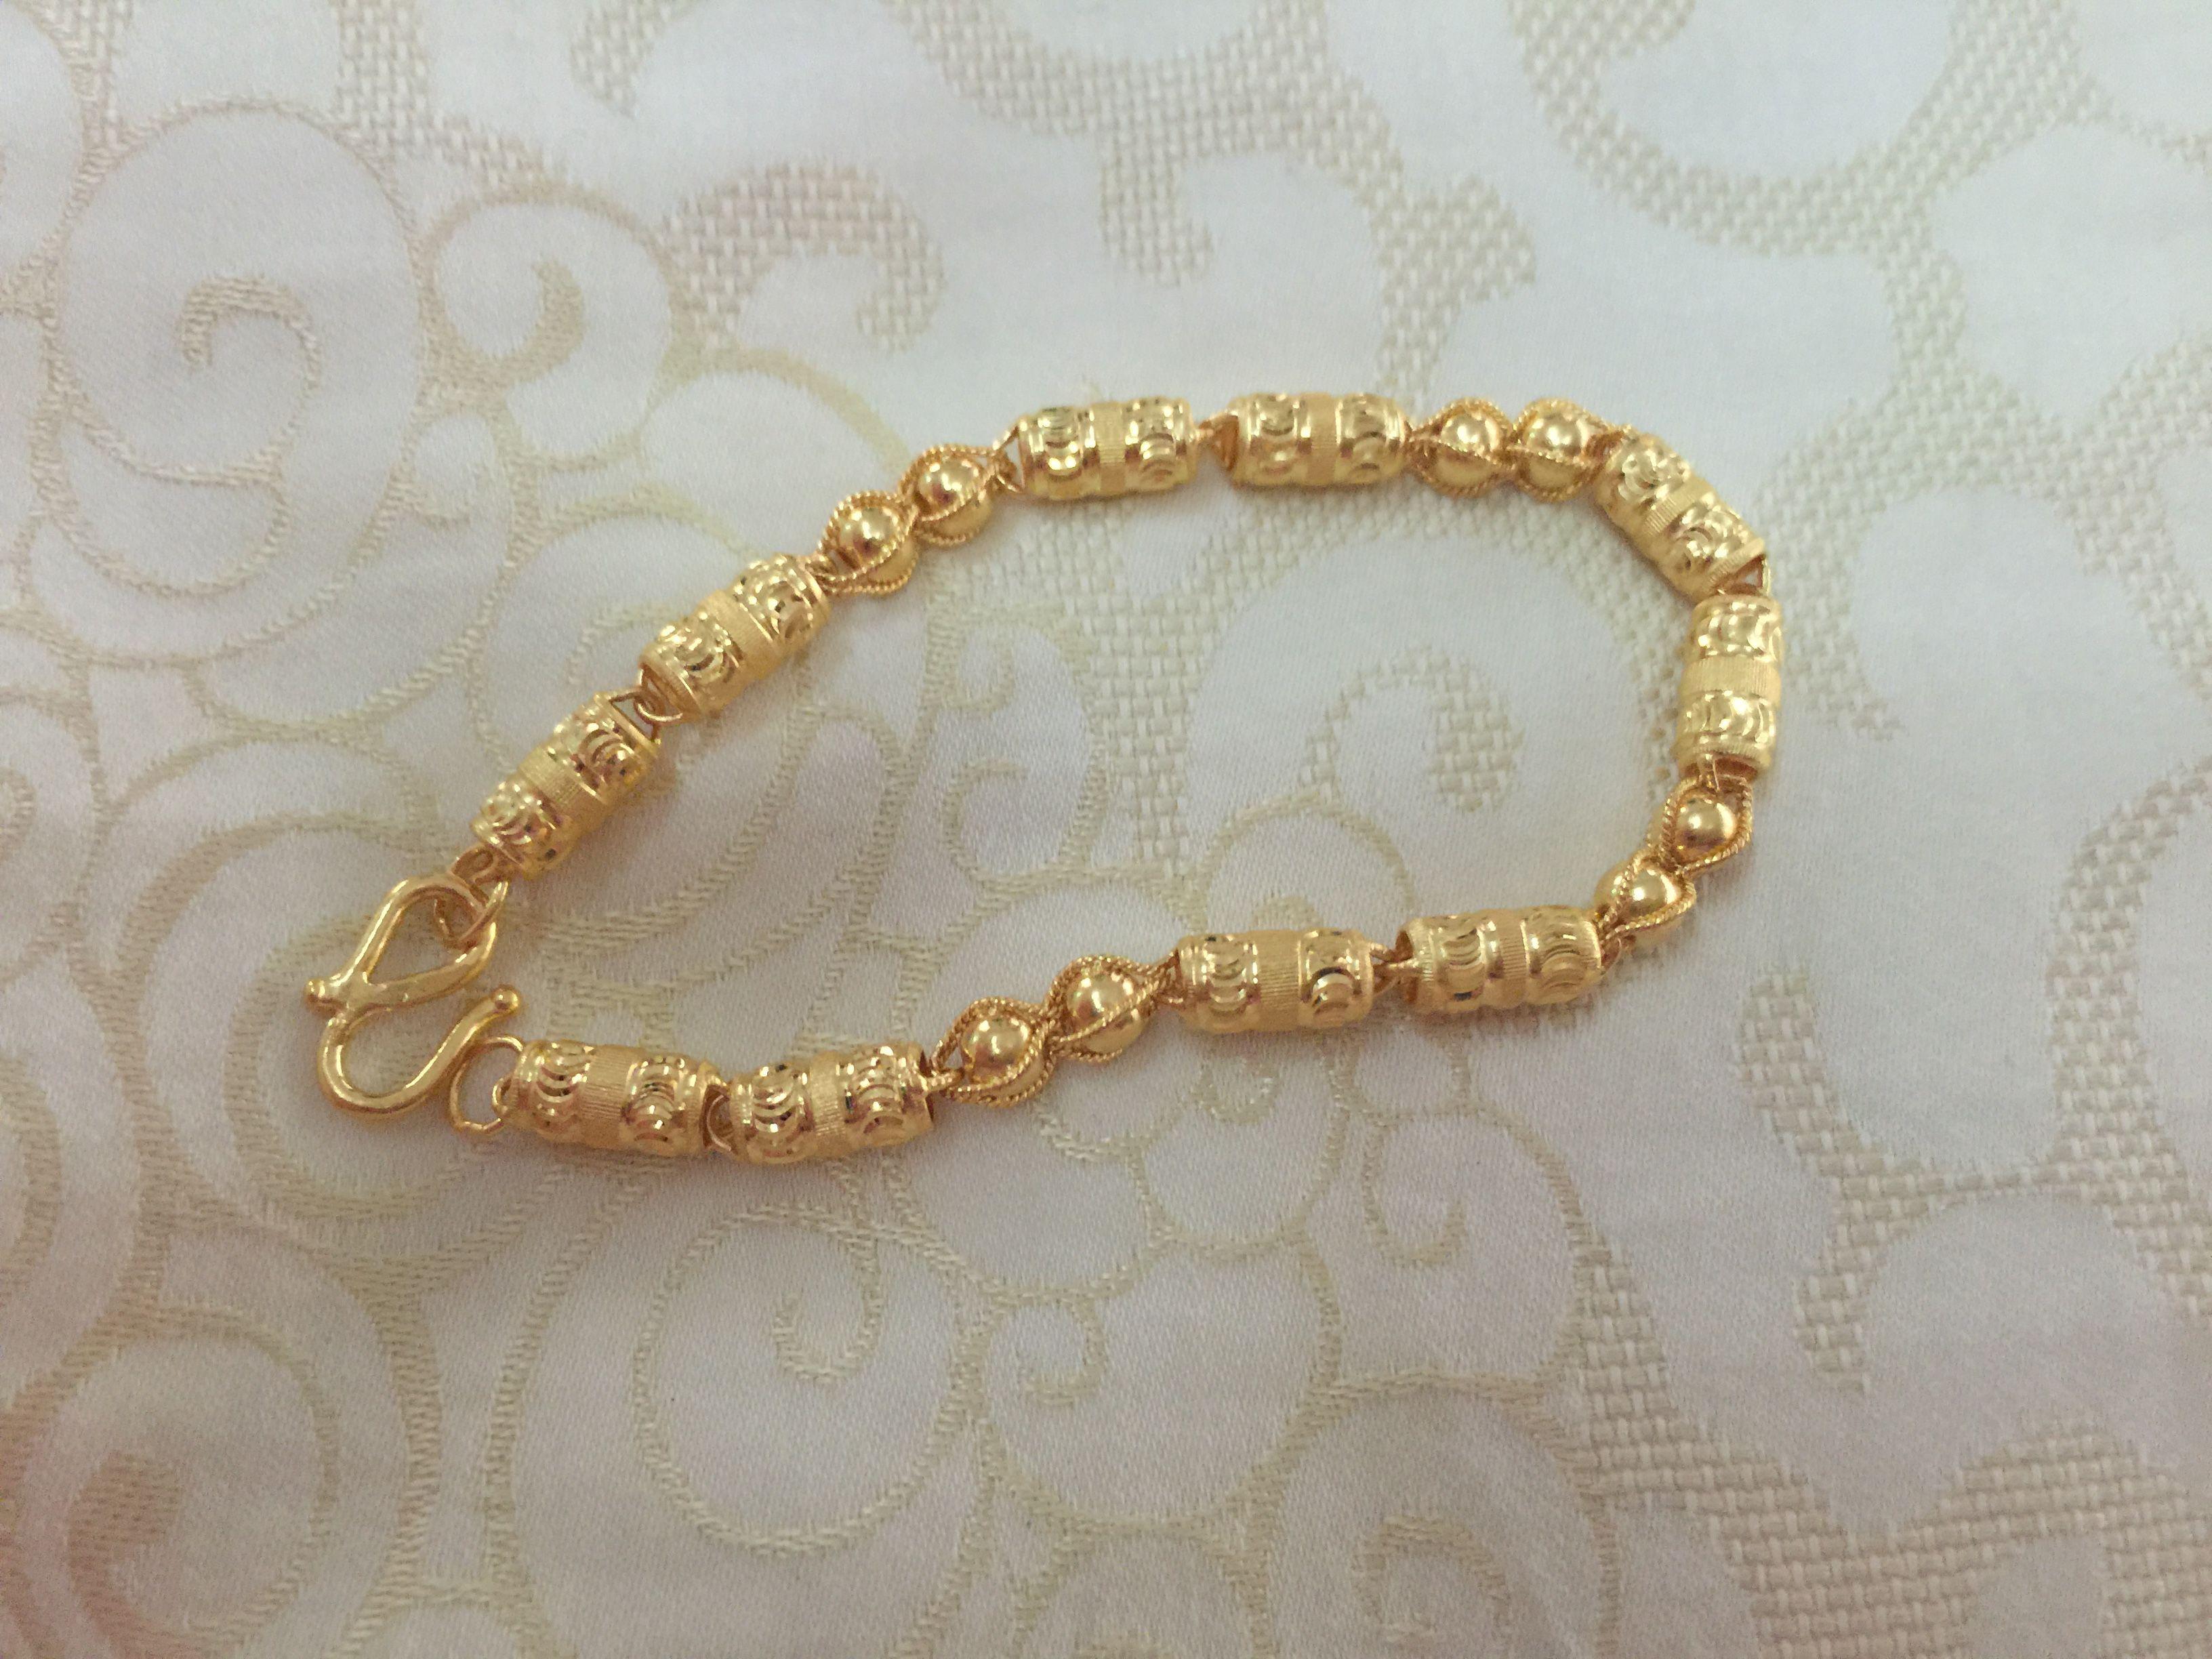 K gold hong kong ornament bracelet kgoldbraceletwomens gold